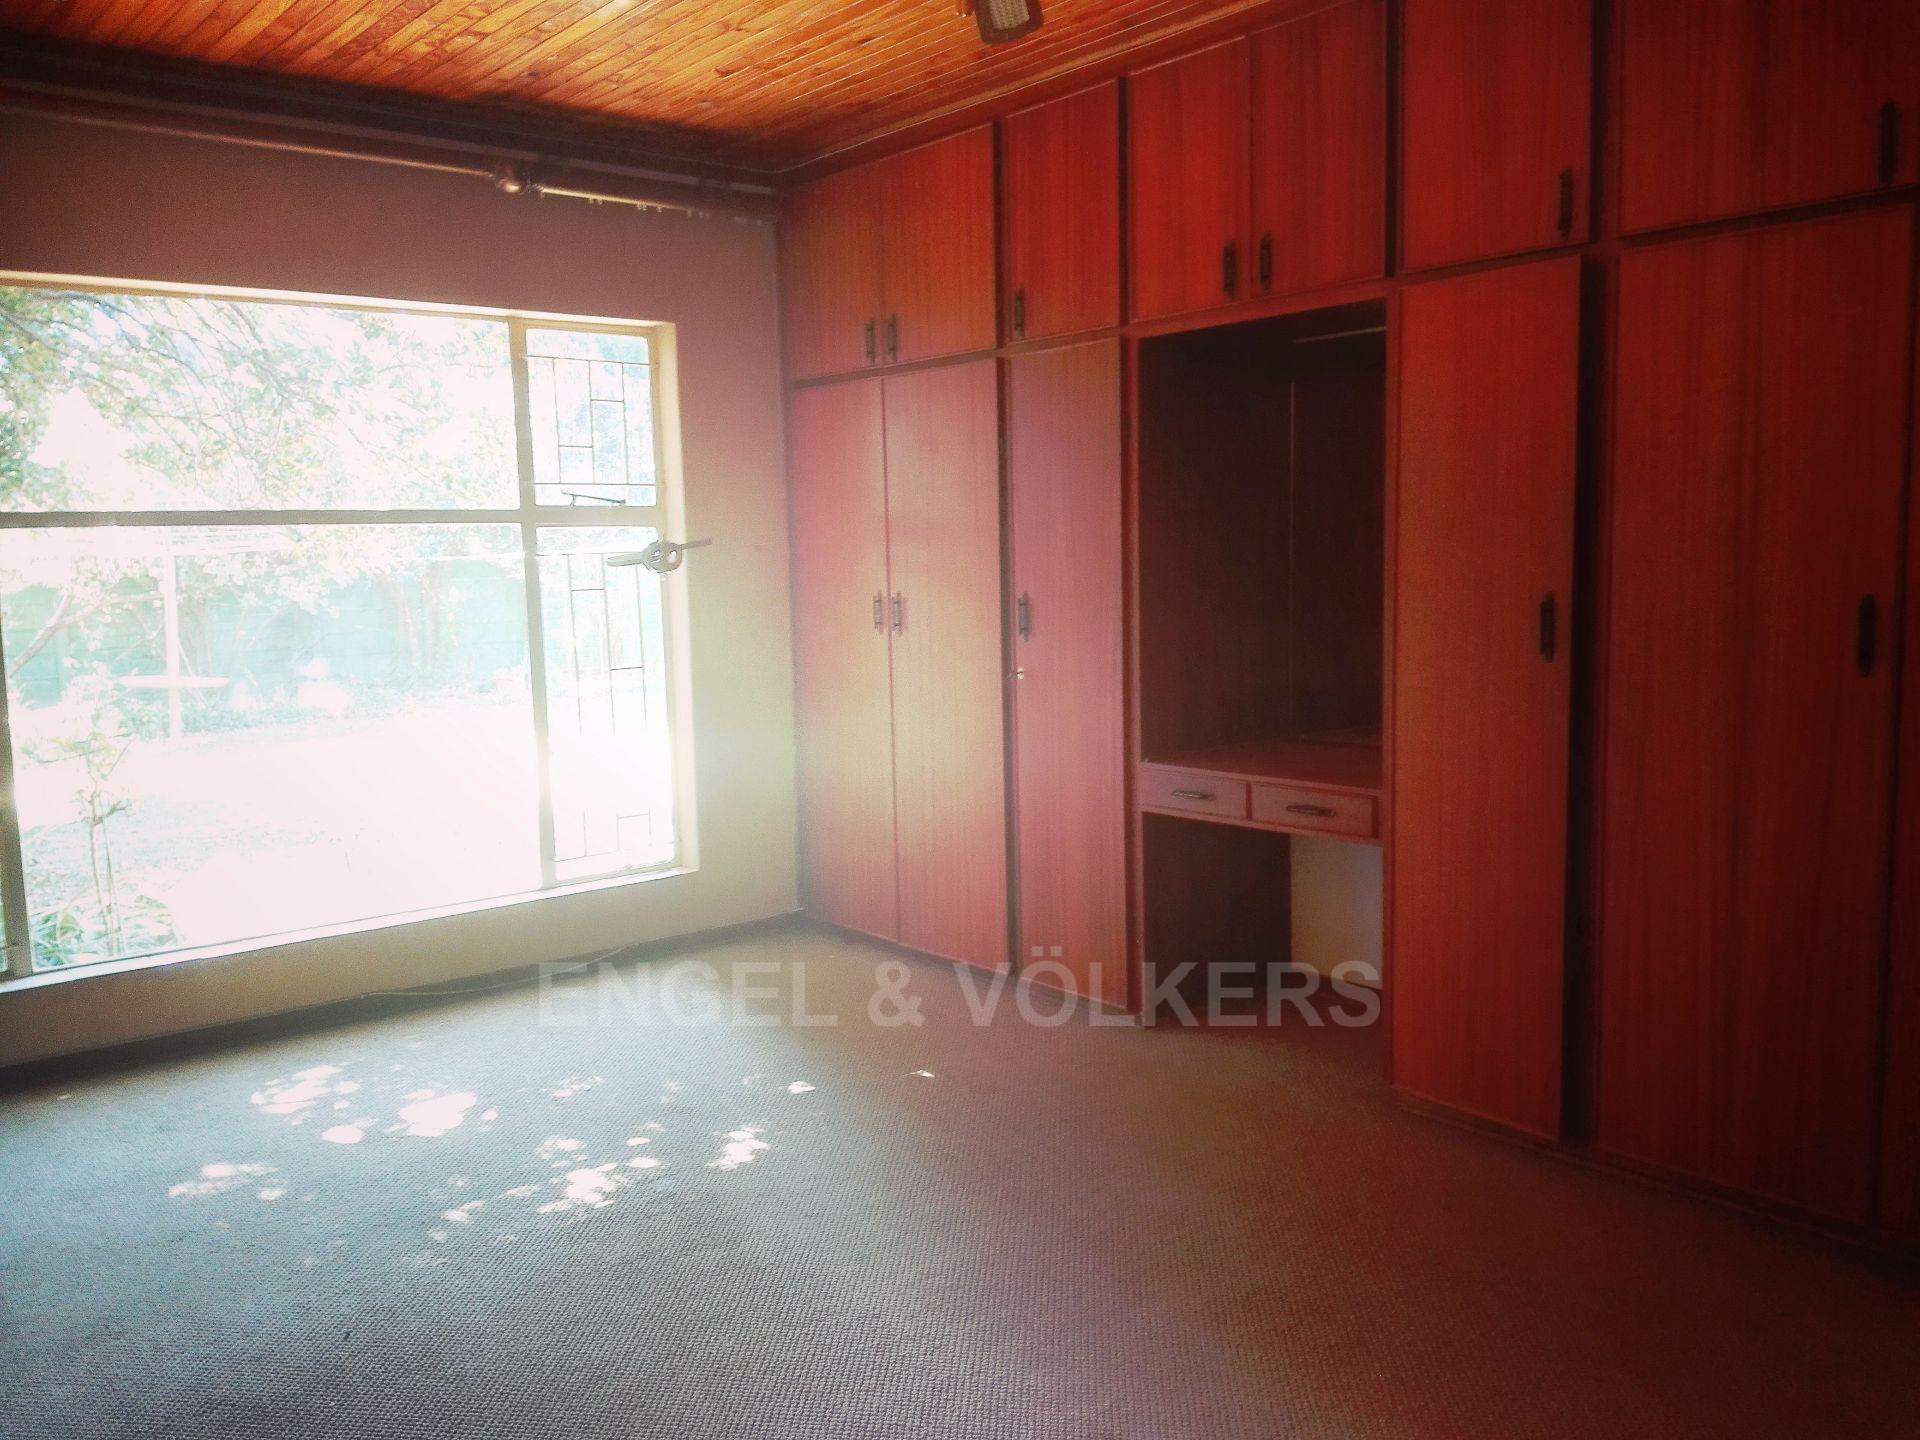 Van Der Hoff Park property for sale. Ref No: 13511325. Picture no 22